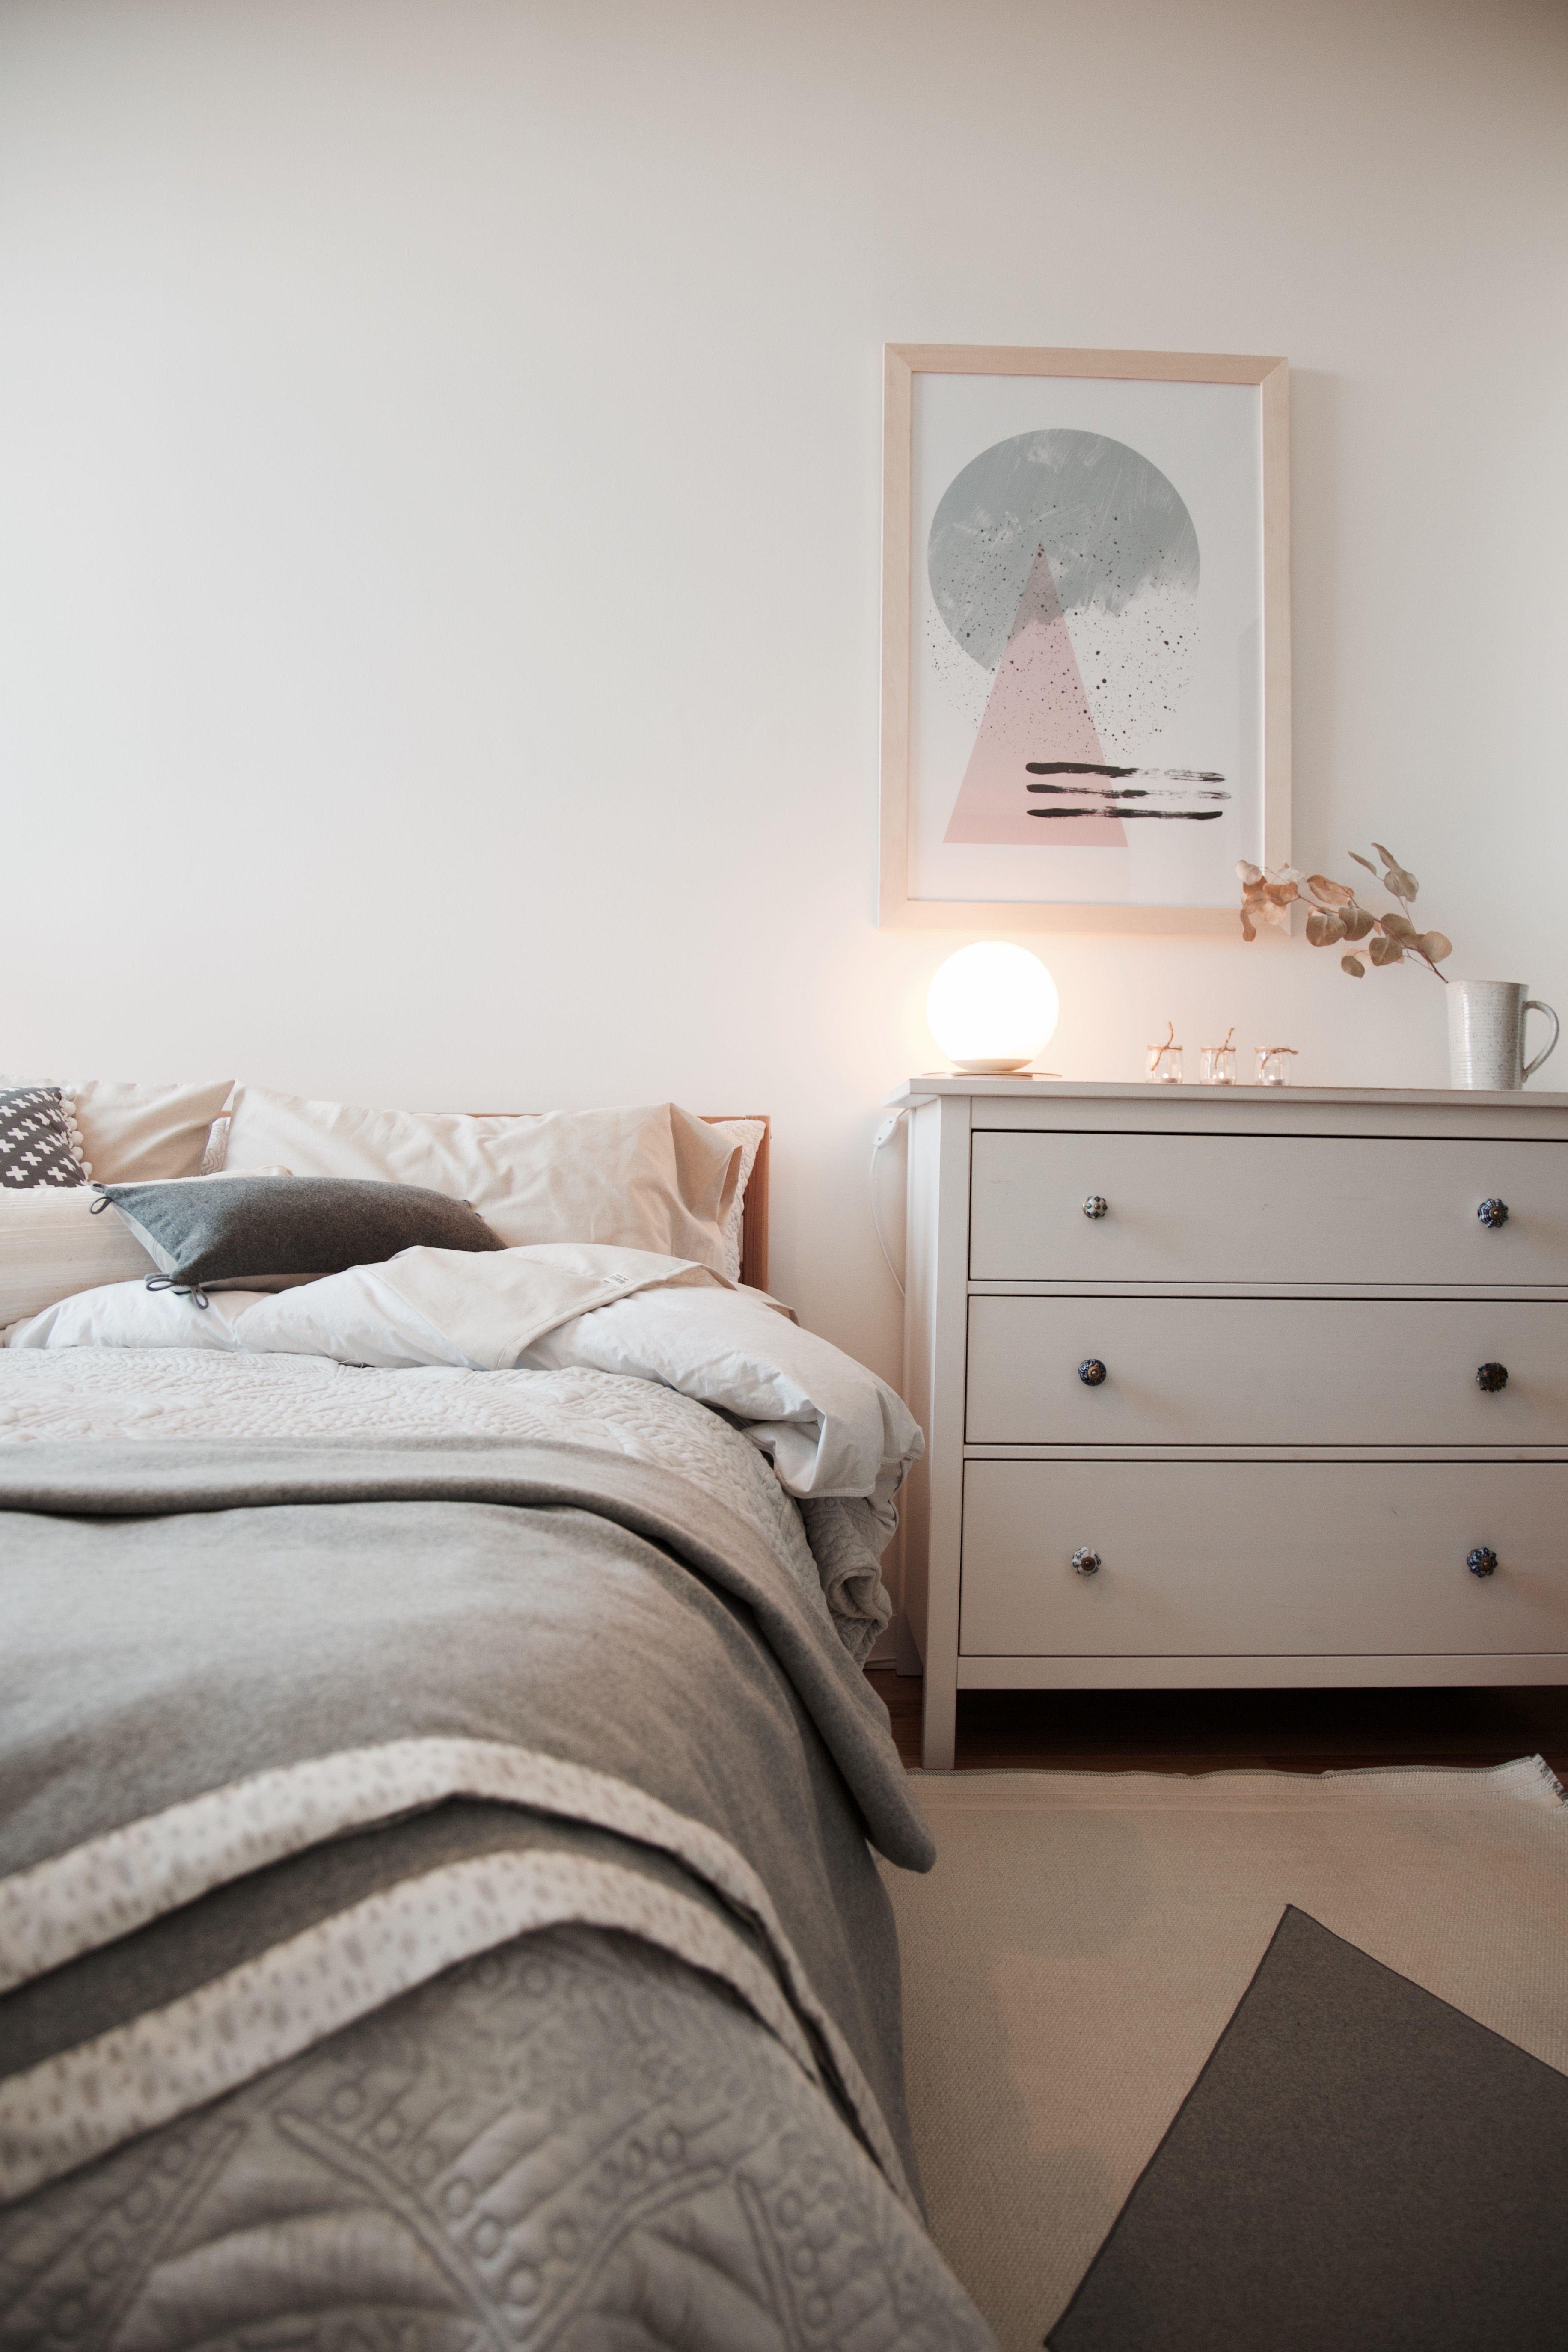 Linge De Maison Montréal wonderful bed linen made in canada #sandinavian #bedroom